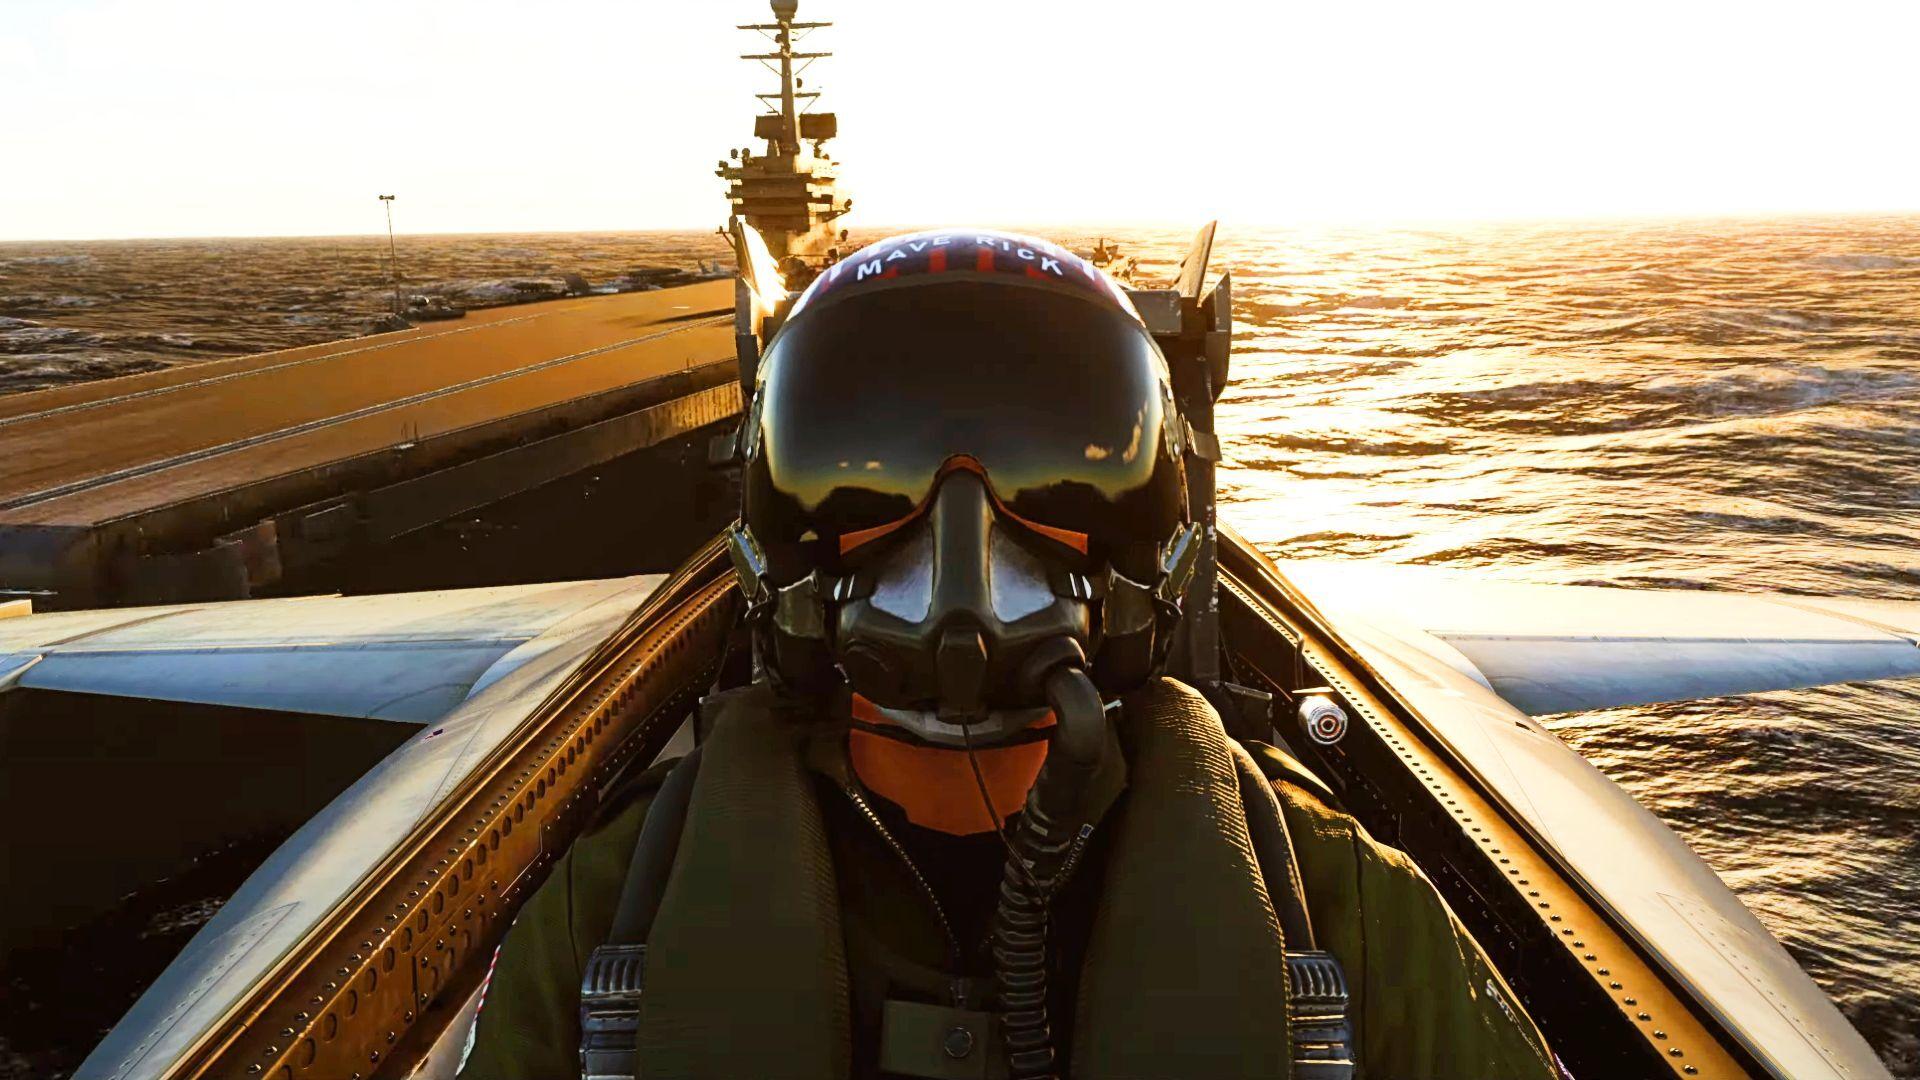 Microsoft Flight Simulator is getting a free Top Gun update this Fall